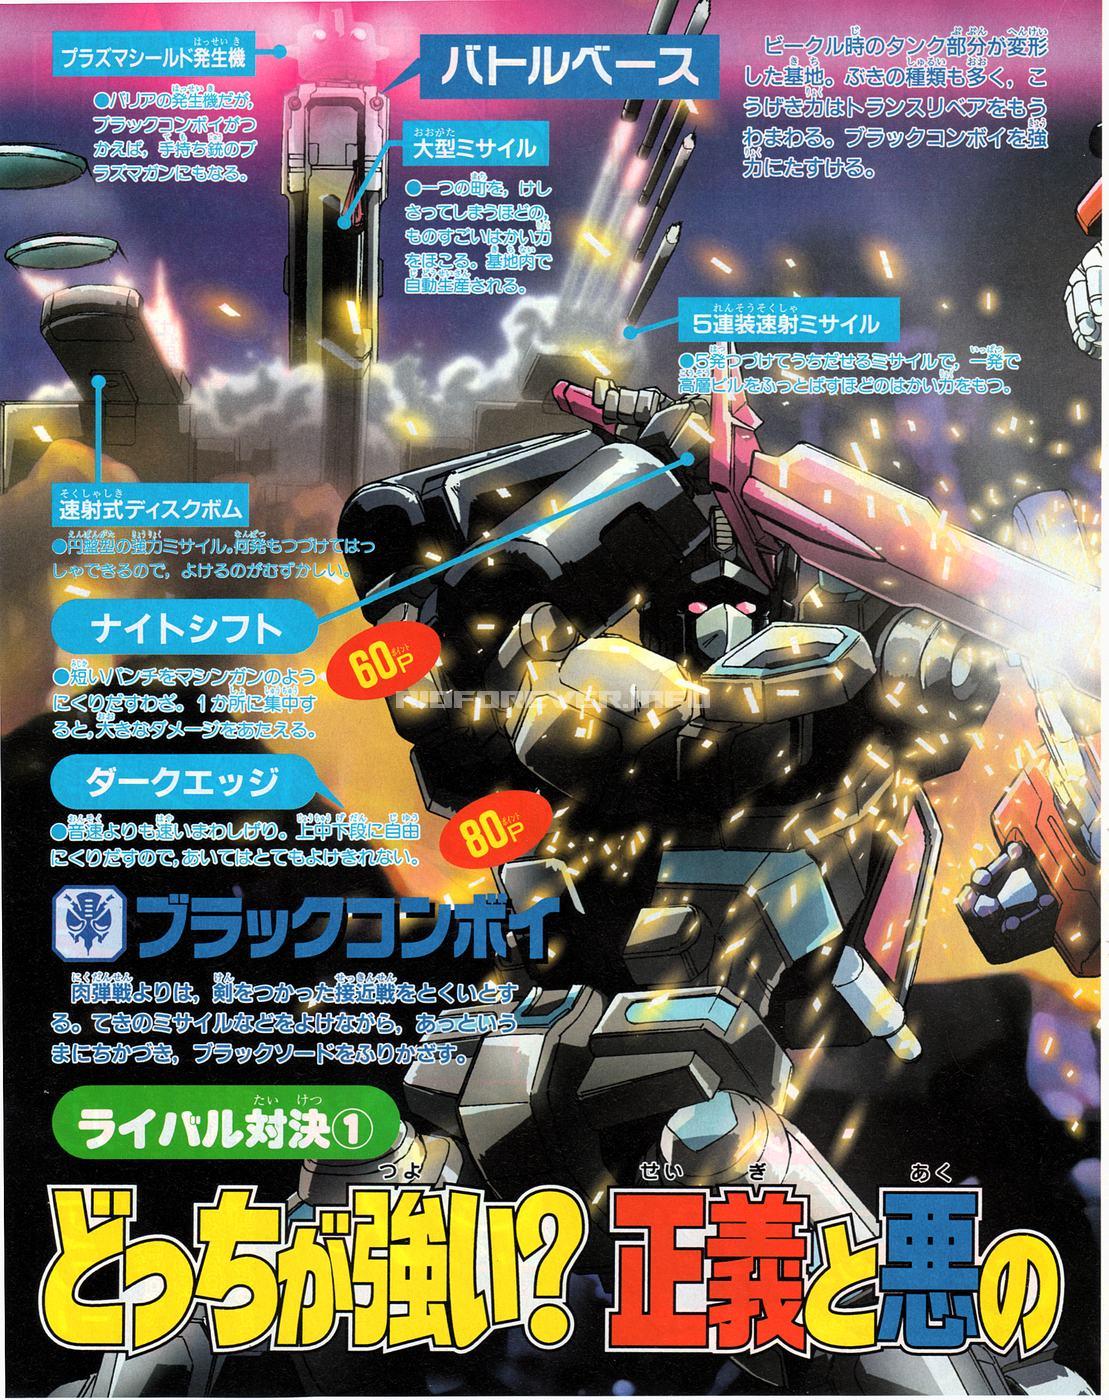 TV Magazine 2000-08-8